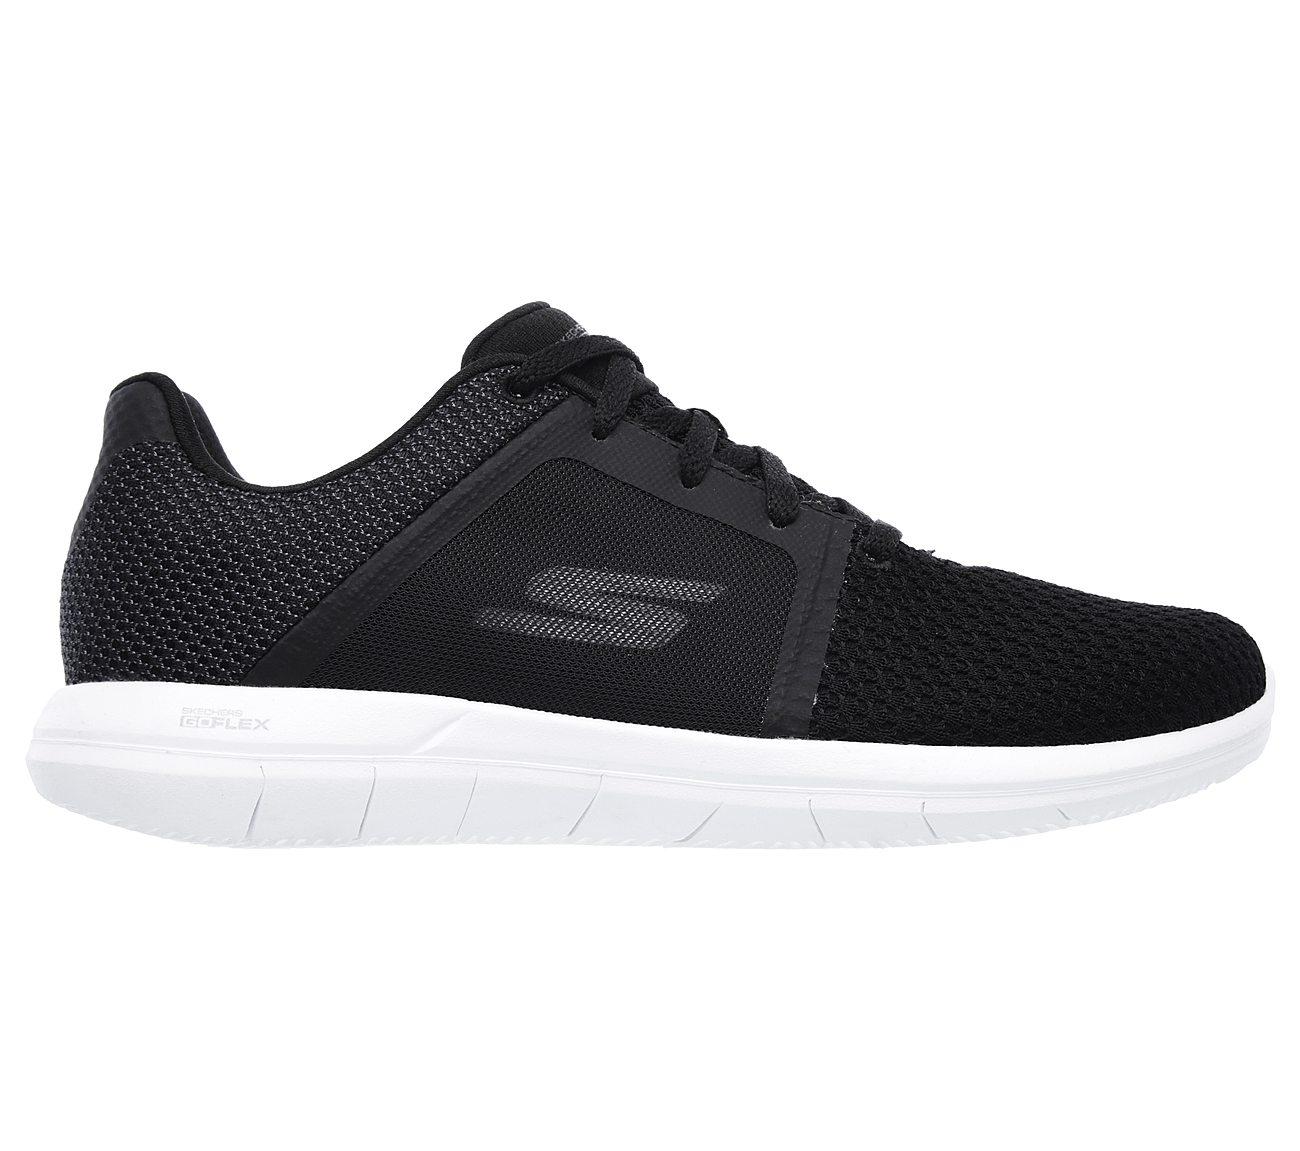 d5d9145fe7b Buy SKECHERS GO FLEX 2 Skechers Performance Shoes only 85